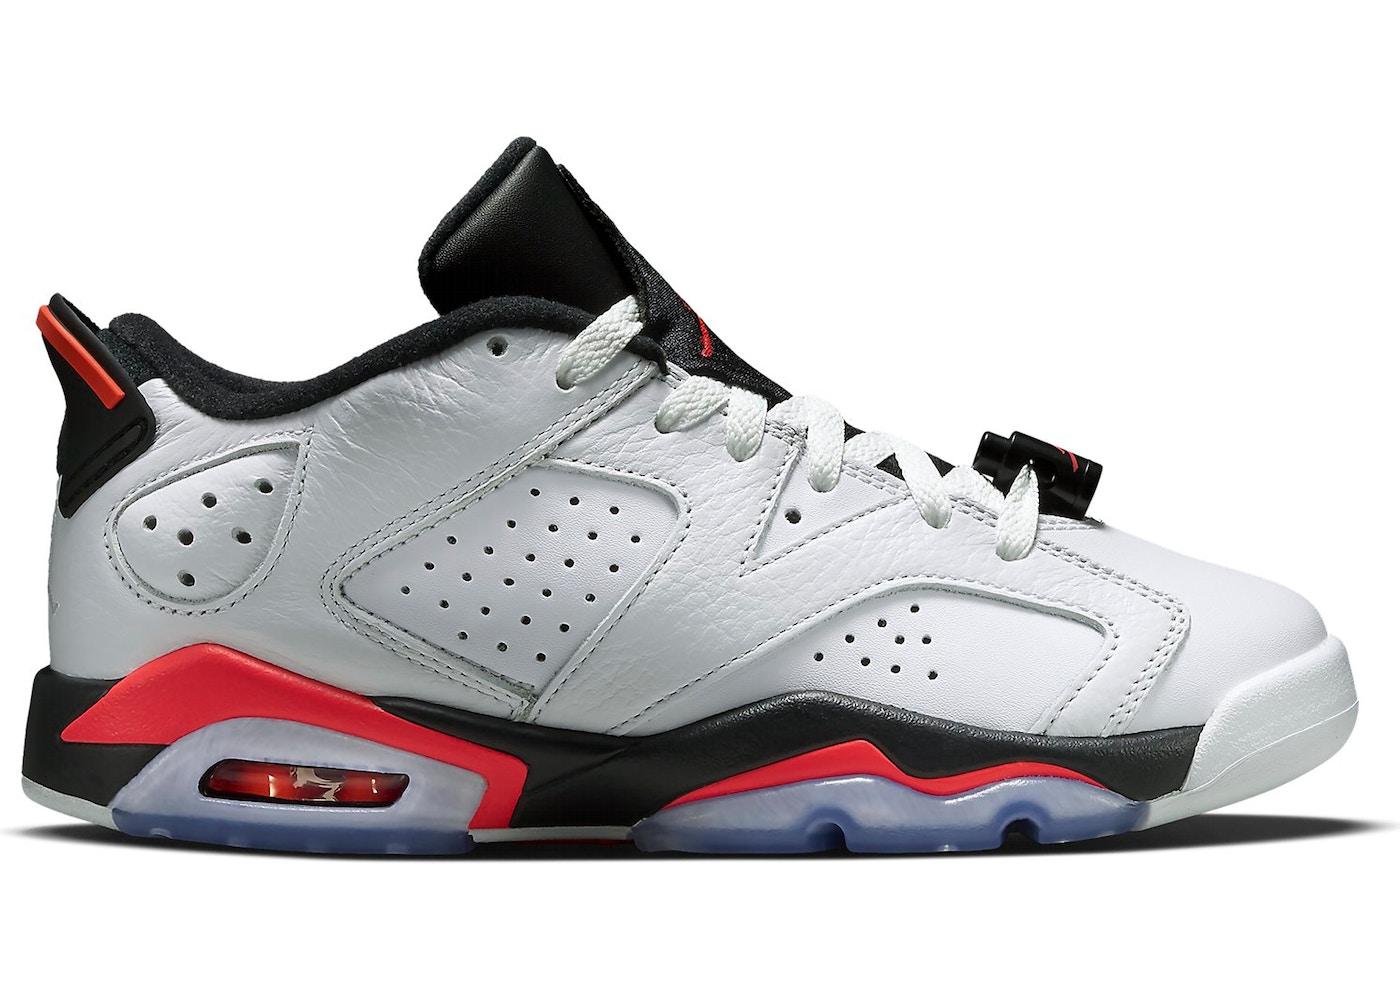 Buy Air Jordan 6 Shoes   Deadstock Sneakers f2eb7d7a89d4e